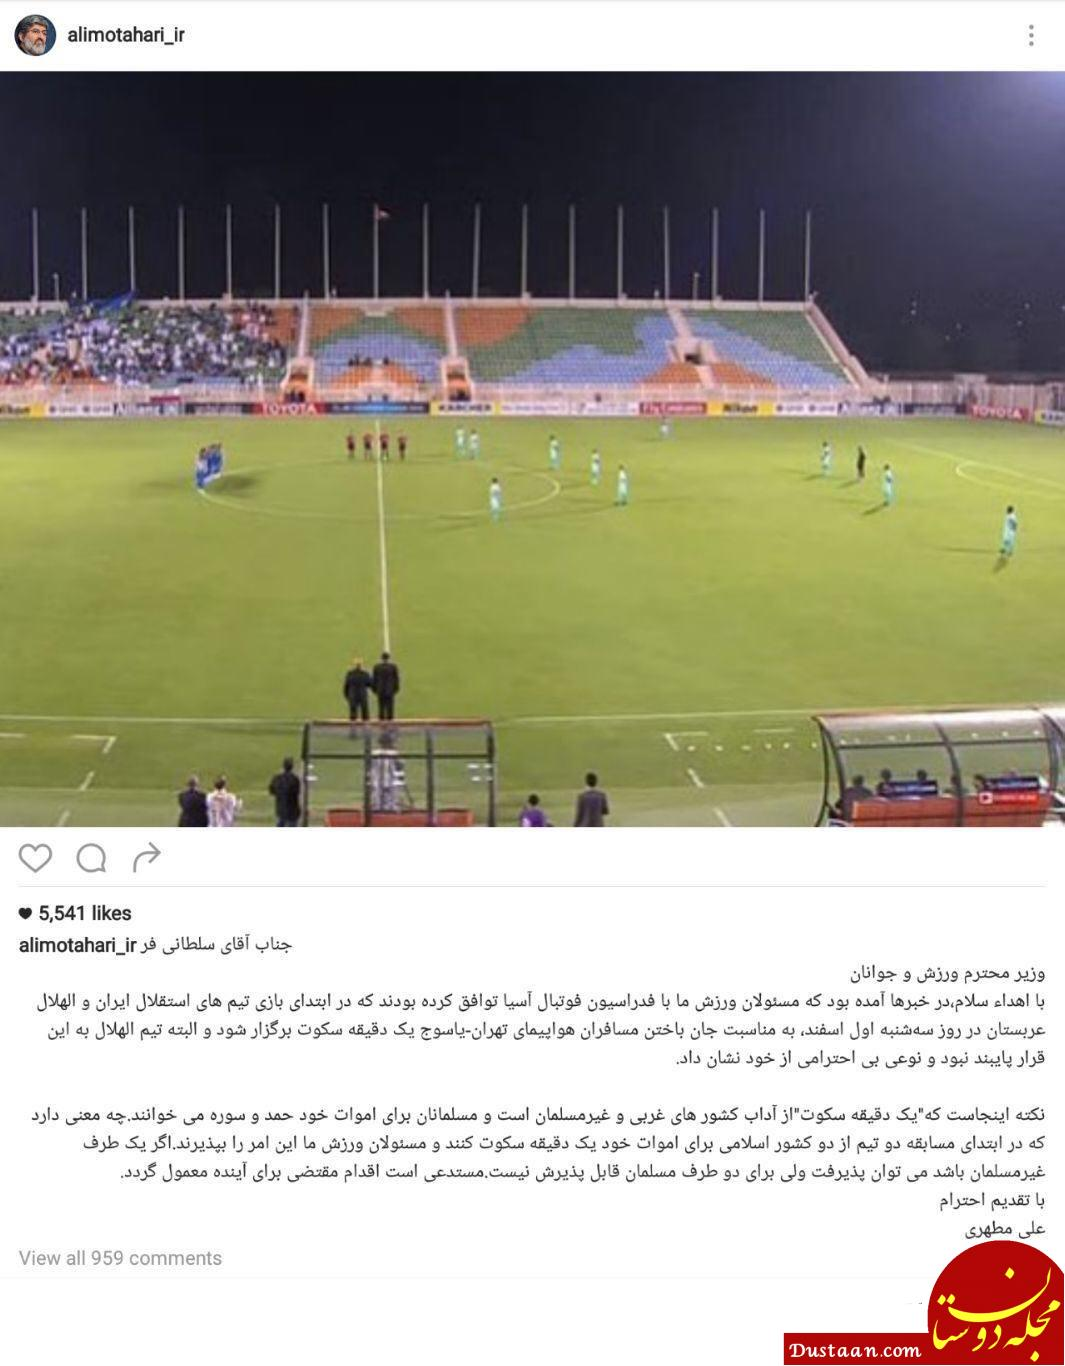 www.dustaan.com واکنش مطهری به حواشی بازی استقلال و الهلال عربستان +عکس